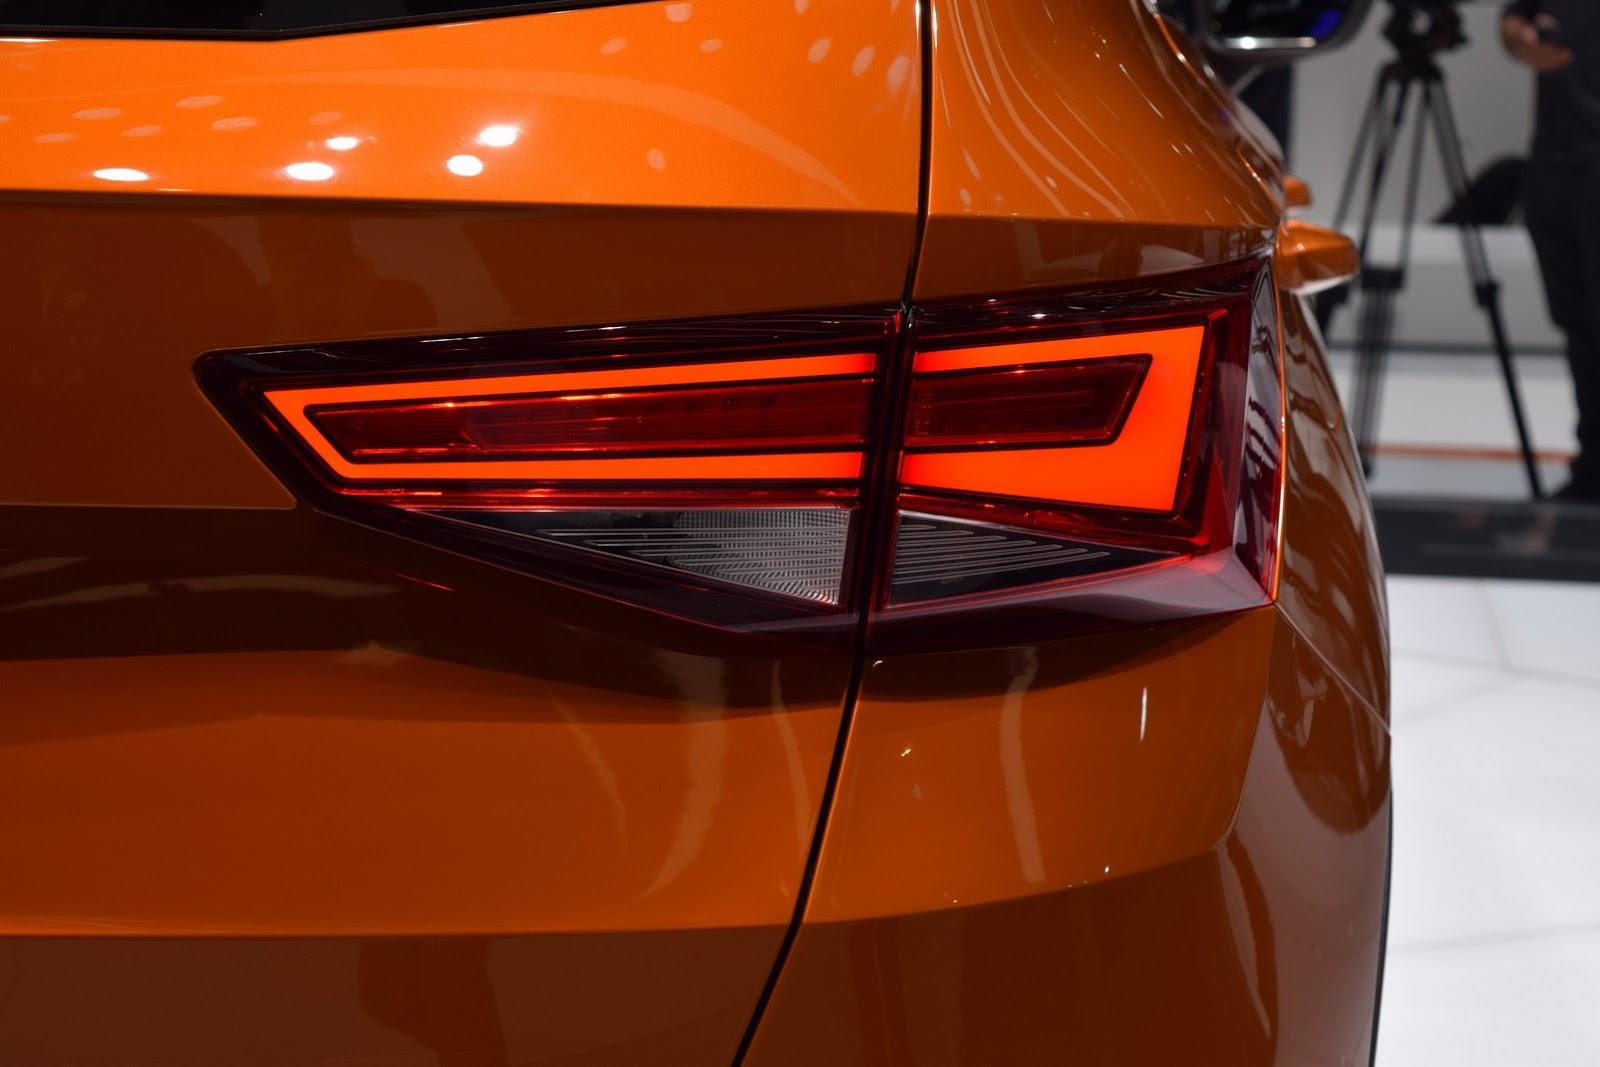 Seat Ateca 2017 - Mẫu SUV cỡ nhỏ bình dân tại Geneva Motor Show 2016